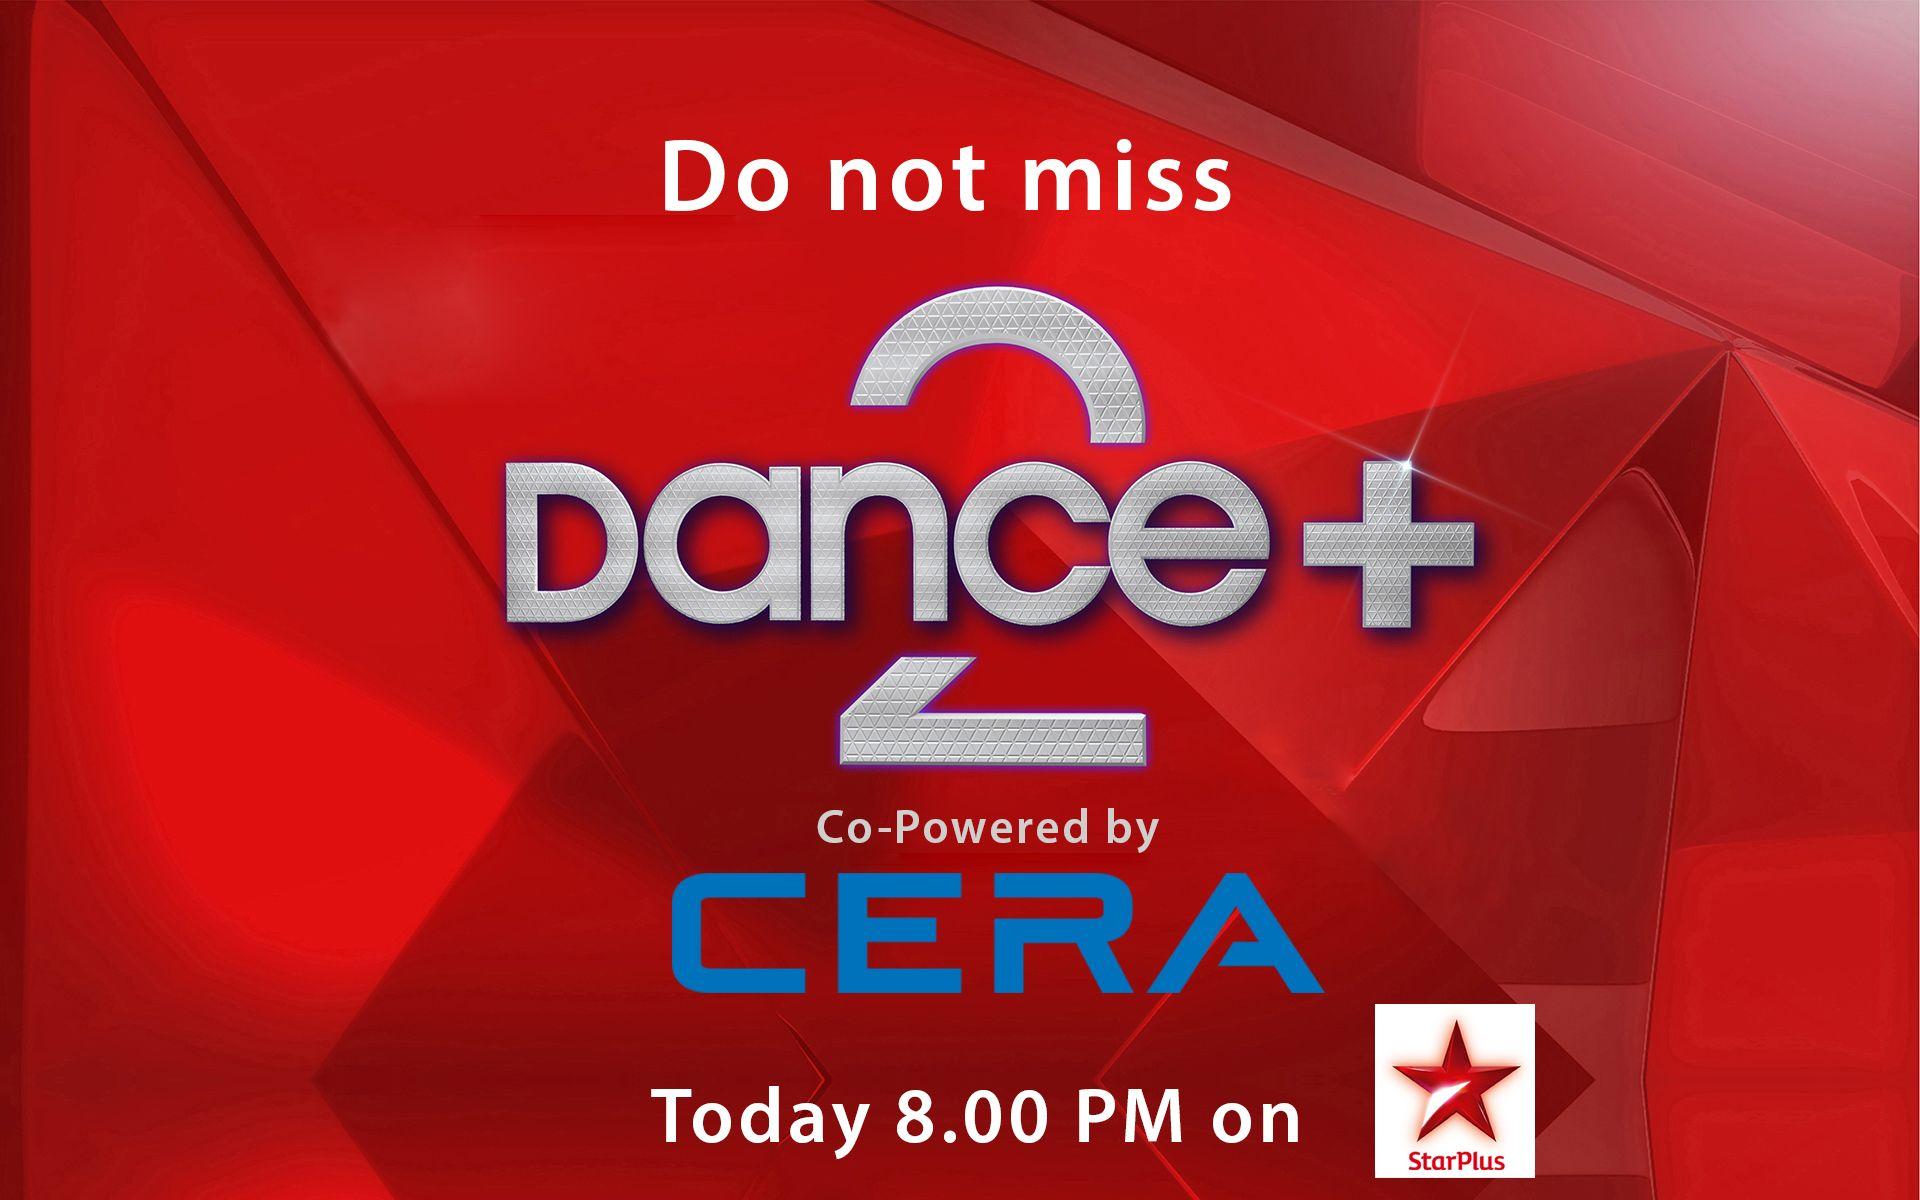 Watch India's most popular #dance show, #DancePlus2! Today, 8 pm onwards.  #CERA #ReflectsMyStyle #StarPlus